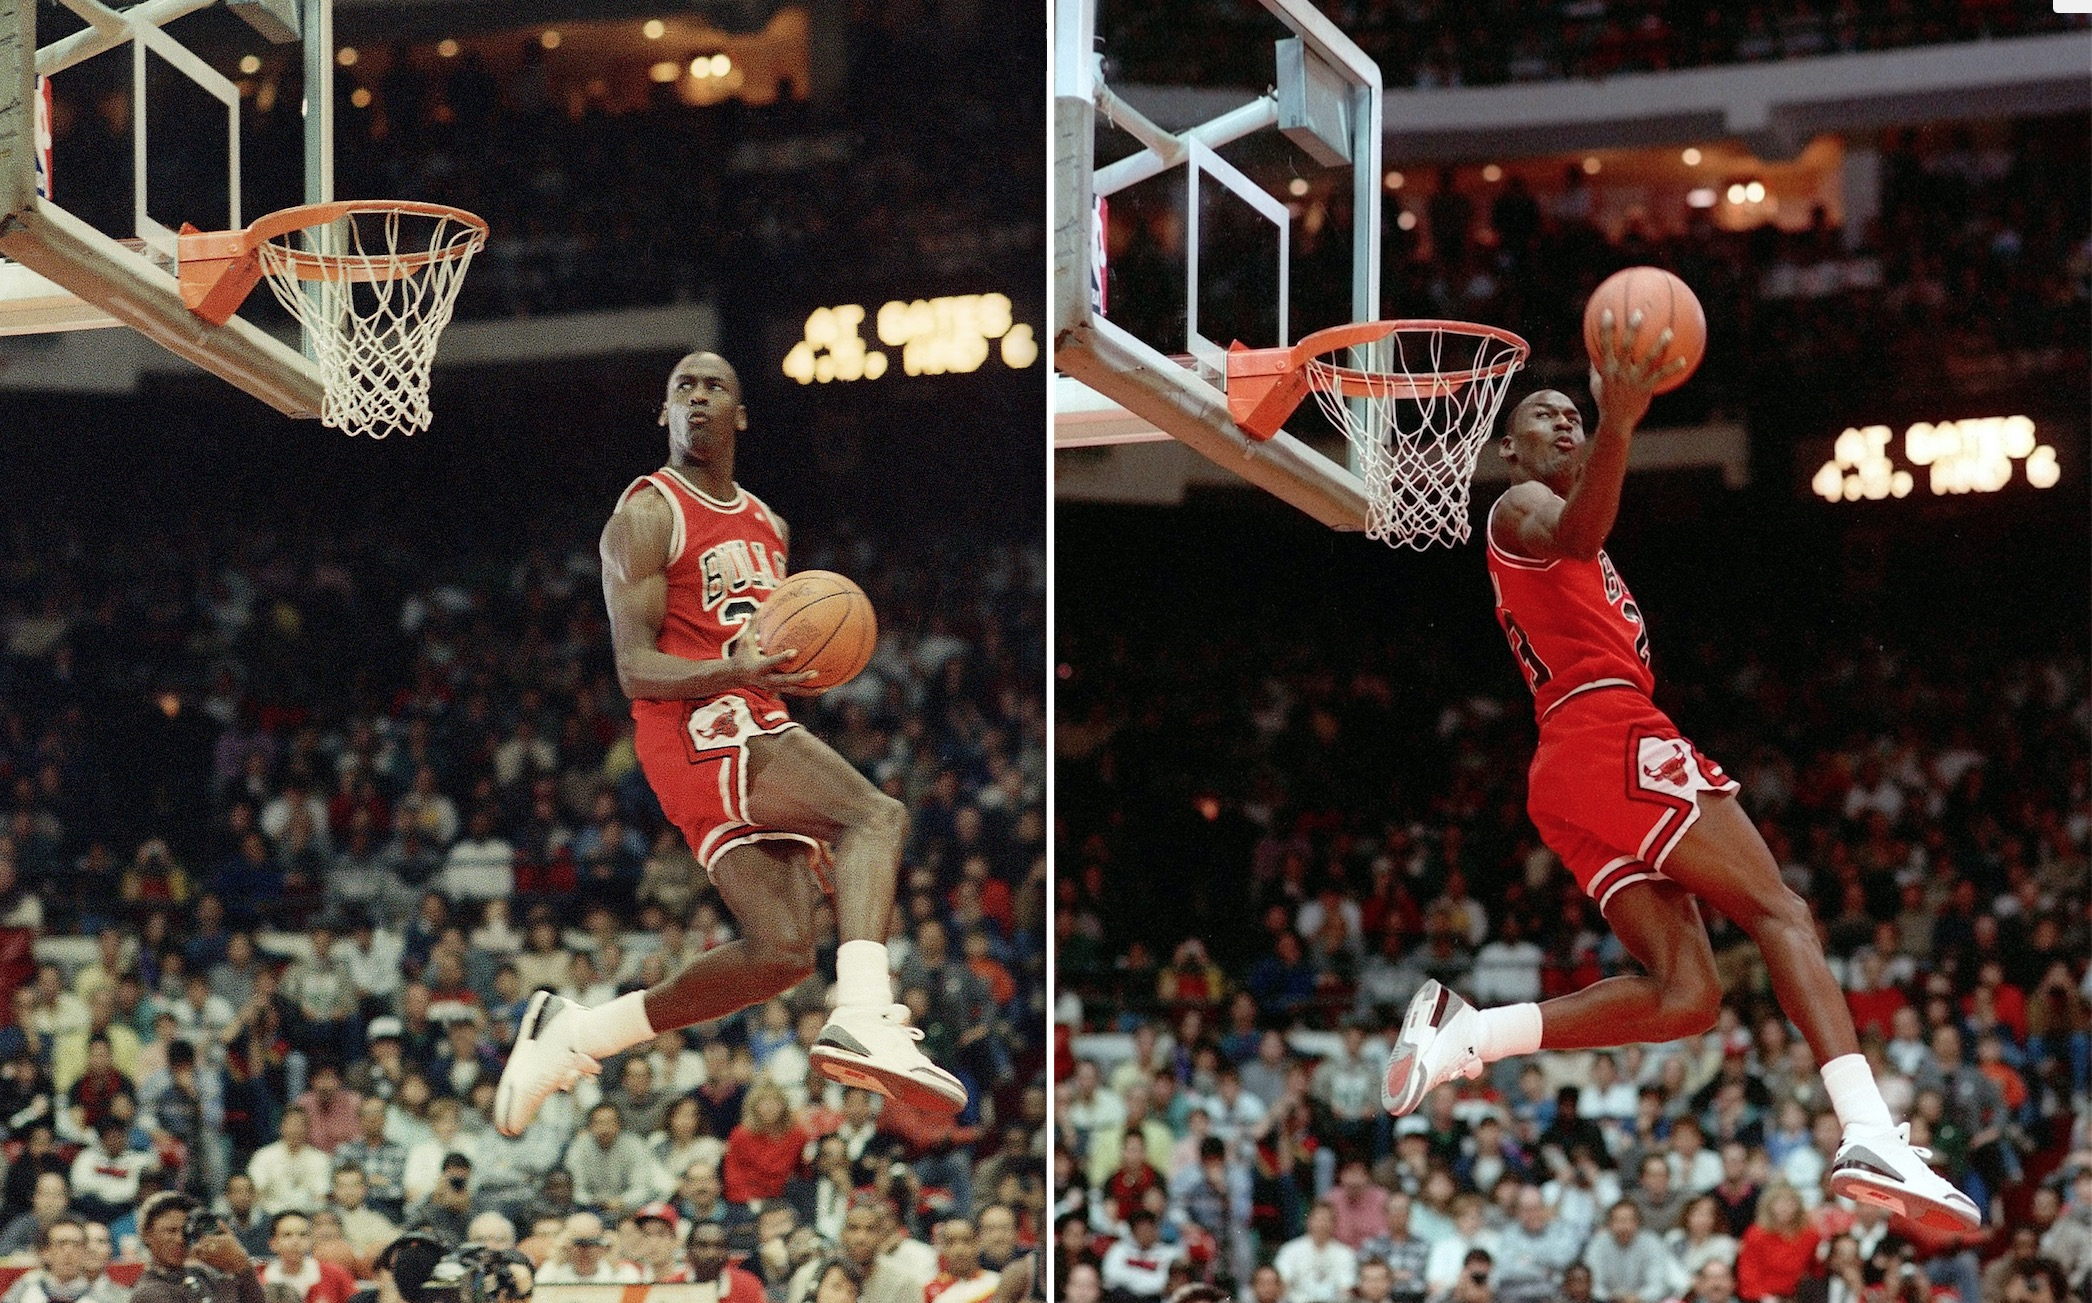 níquel pestillo entrevista  NBA Fan Gets Tattoo of Michael Jordan's Famous 1988 Free Throw Line Dunk